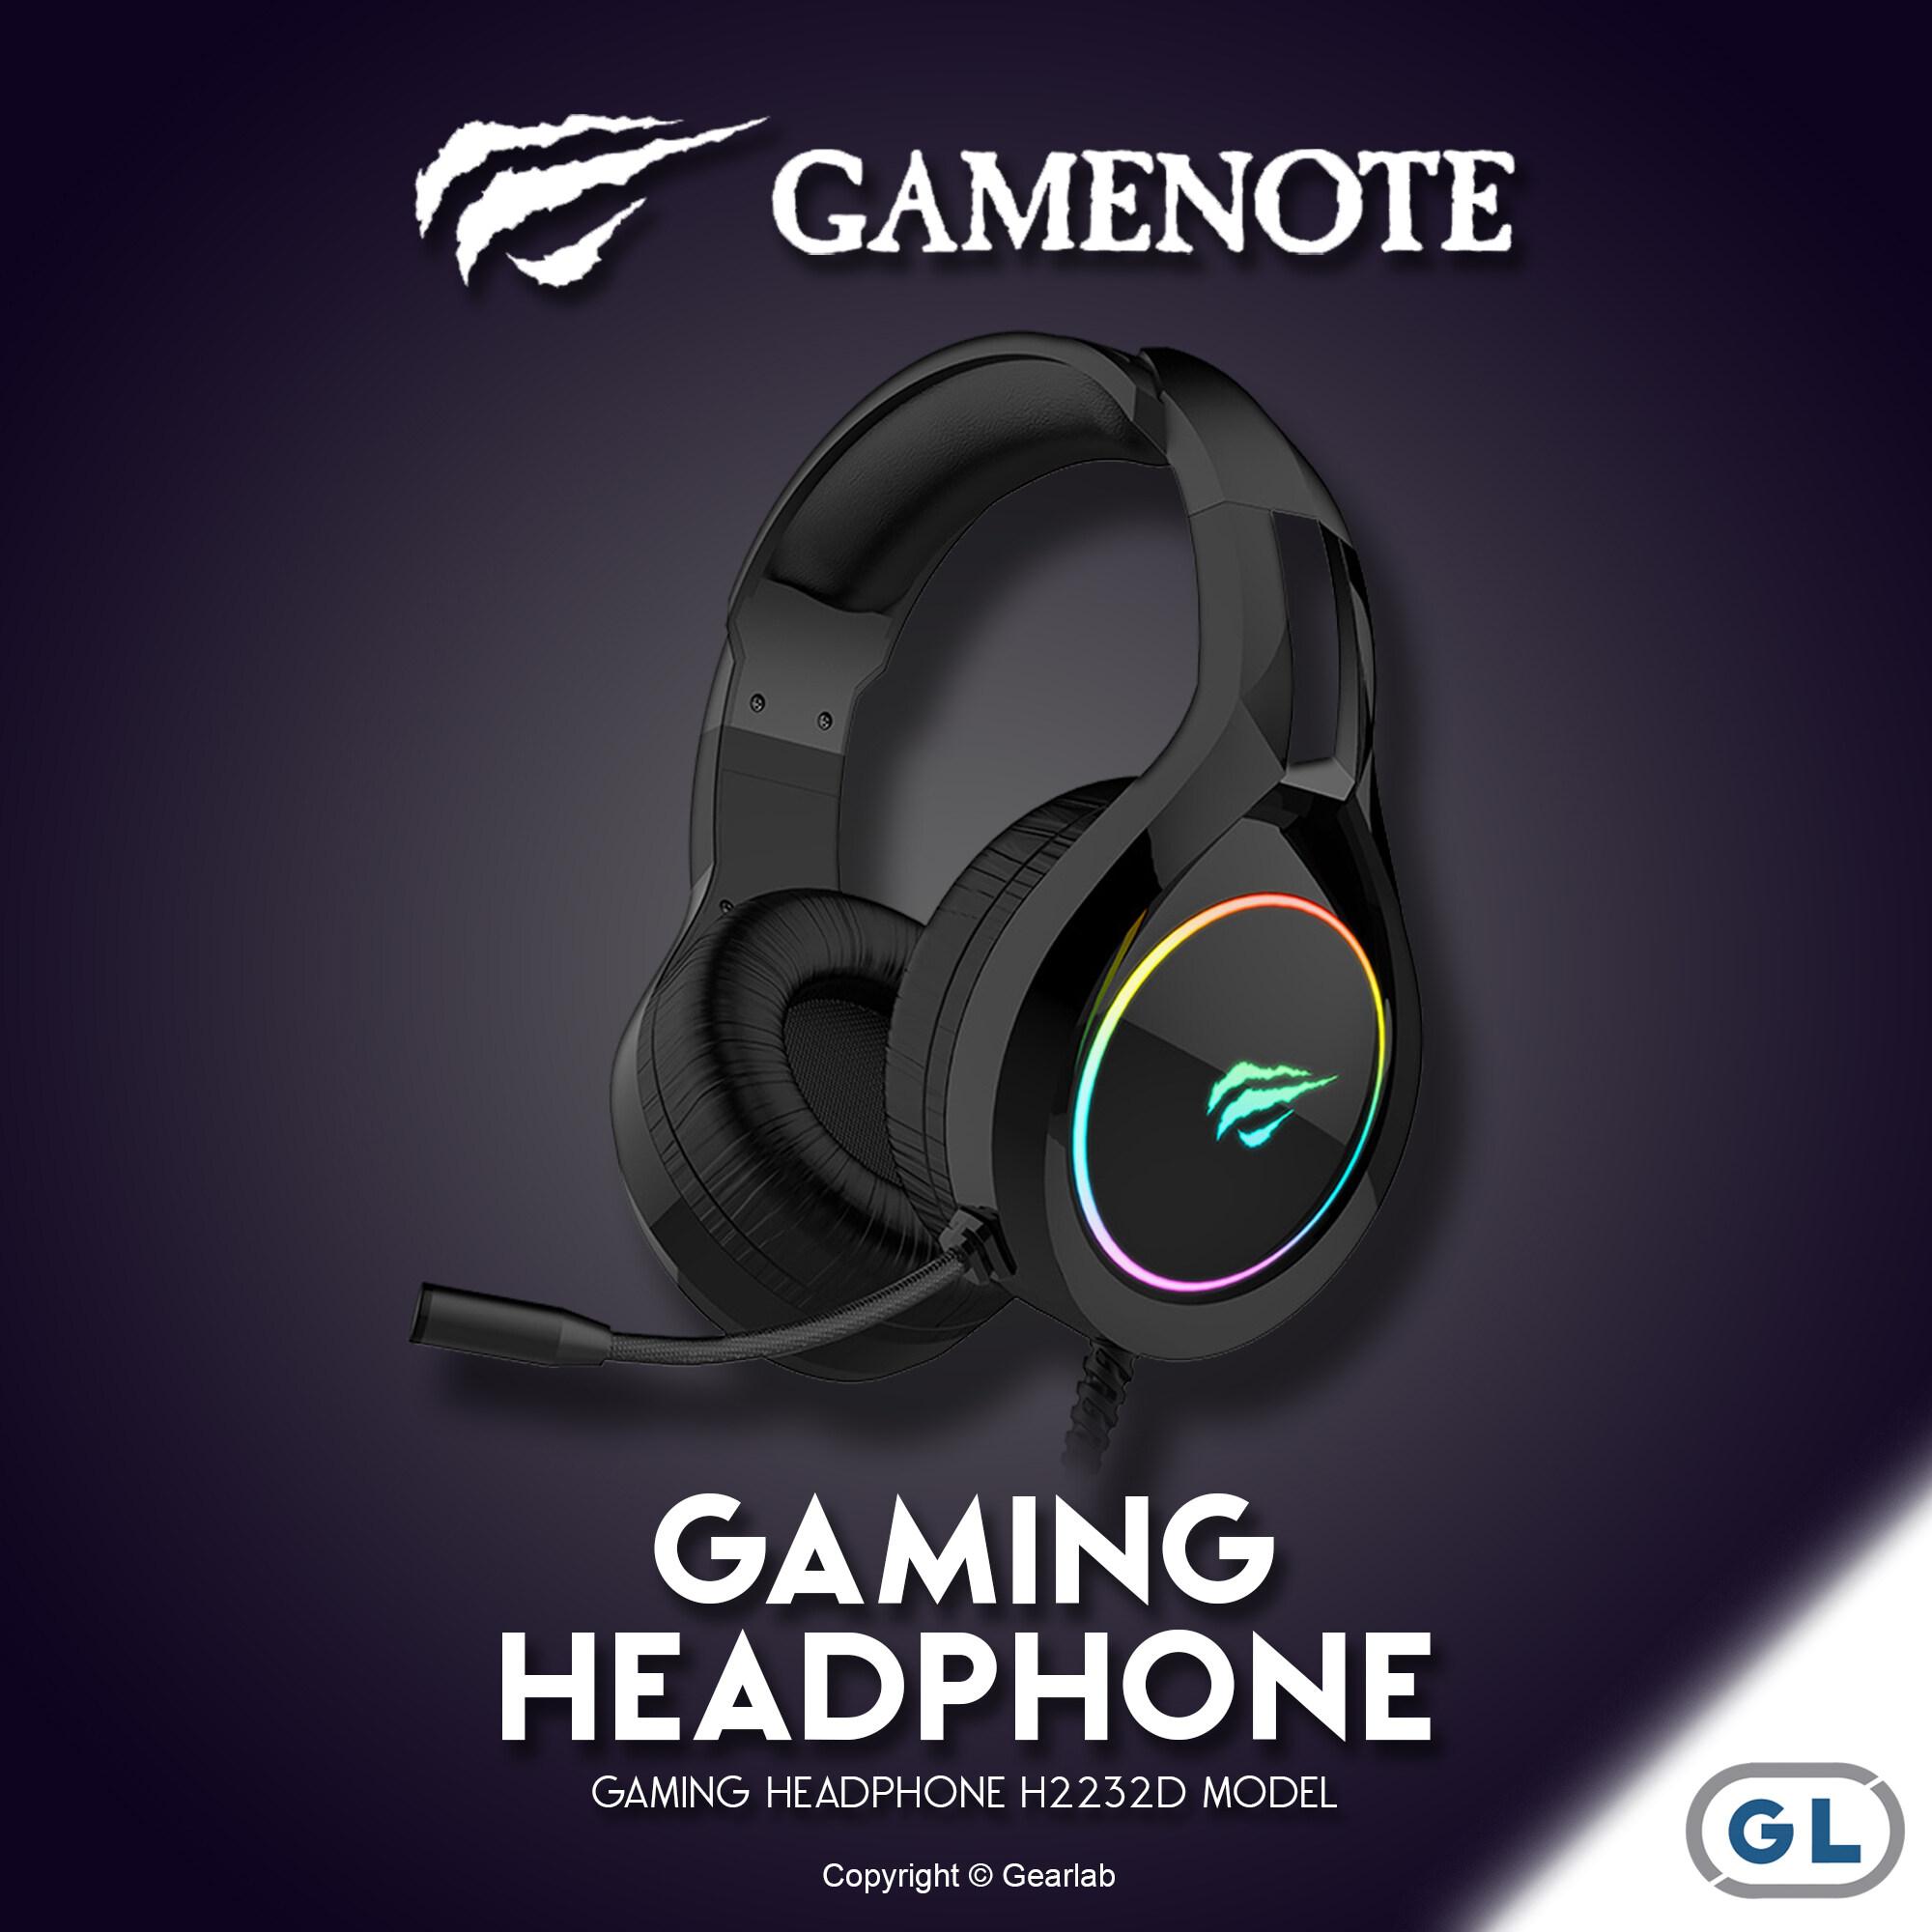 Gamenote Gaming Headphone หูฟังเกมมิ่ง หูฟังเล่นเกมส์สำหรับคอมพิวเตอร์ มีไฟ Rgb Backlit Gh 2232 Havit.